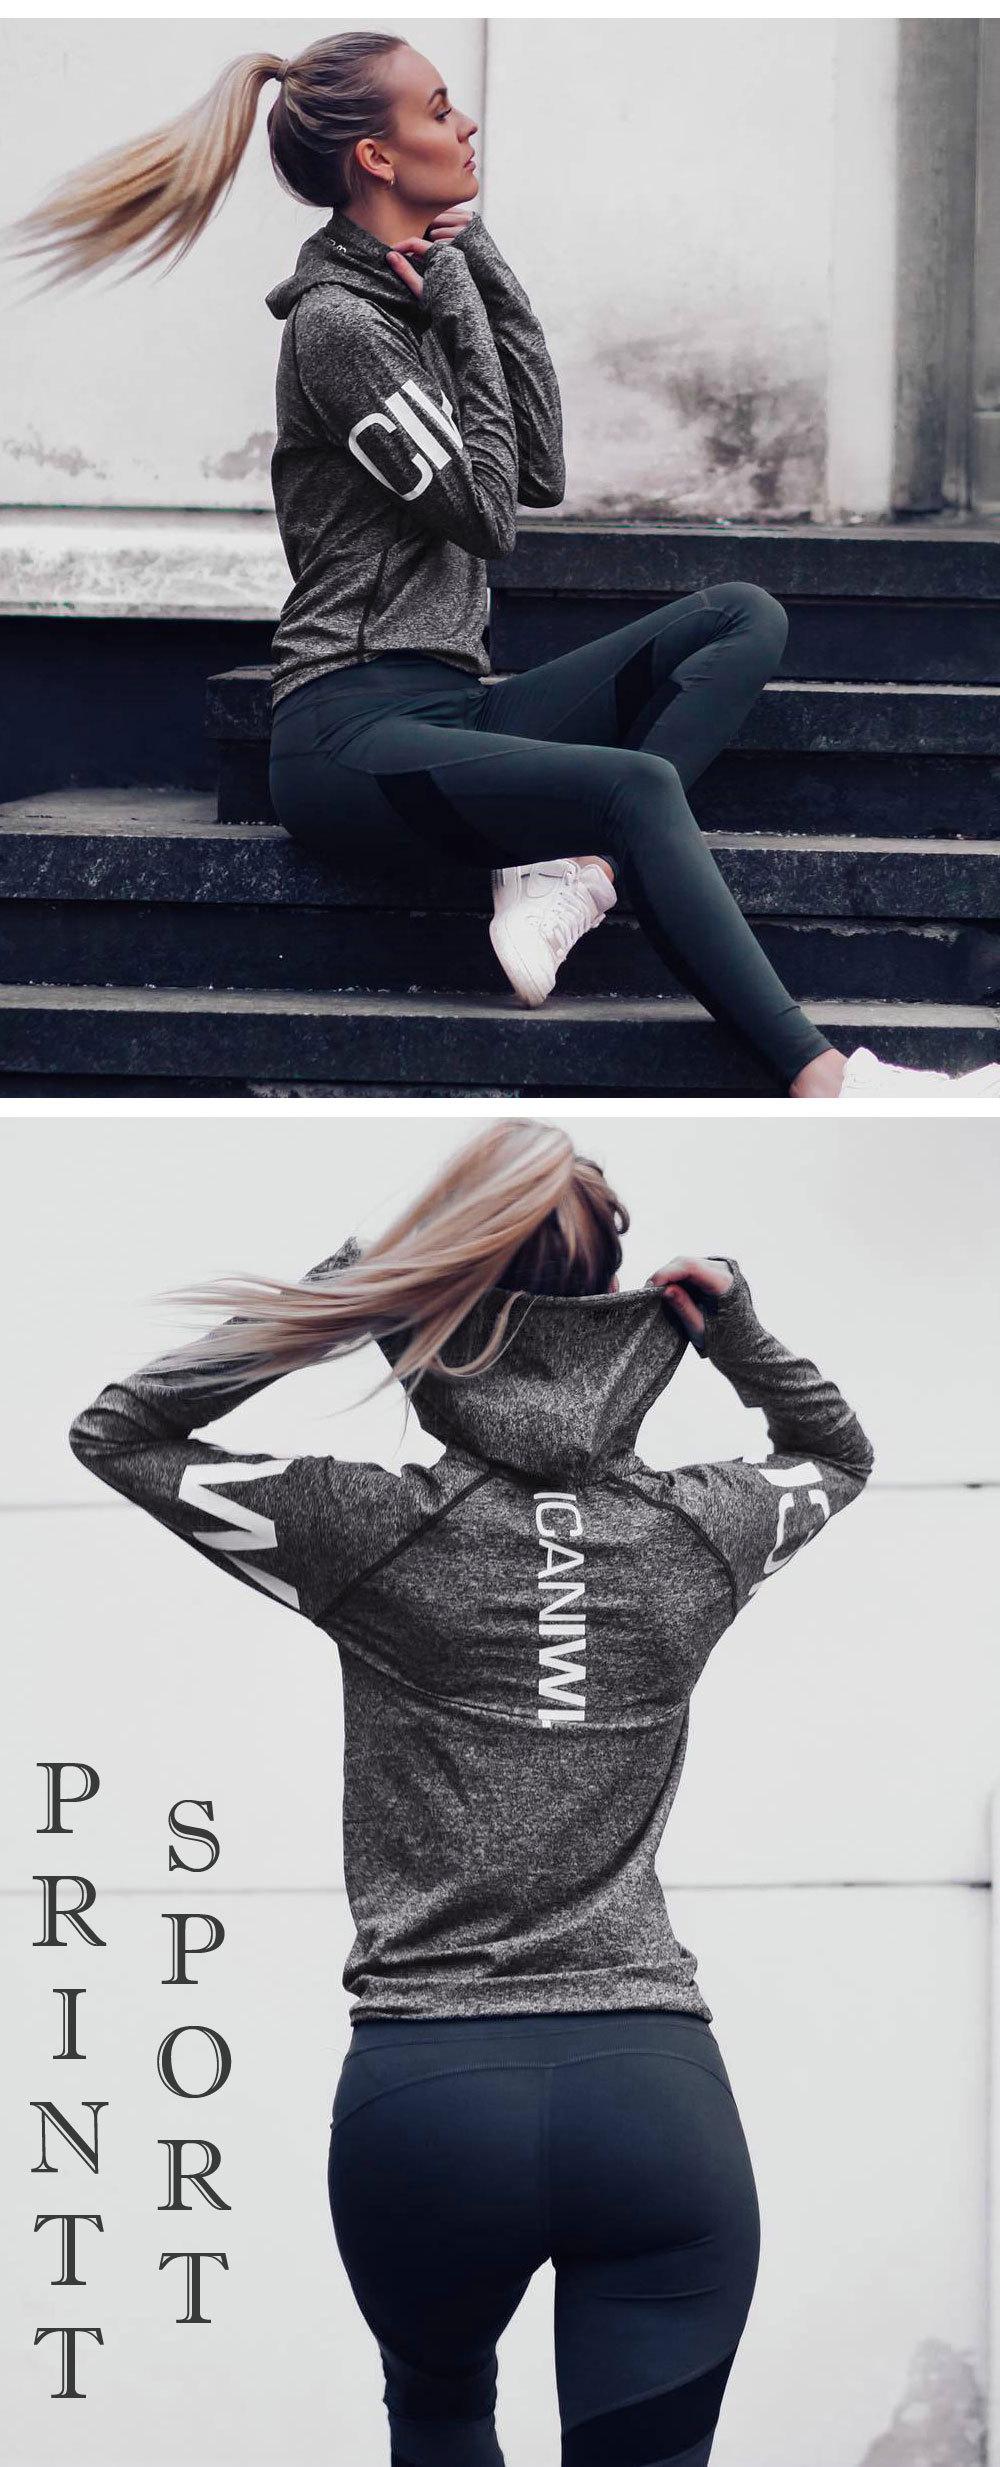 Fitness Breathable Sportswear Women T Shirt Sport Suit Yoga ShirtsTop Quick-Dry Running Shirt Gym Clothes Sport Shirt Jackets 5